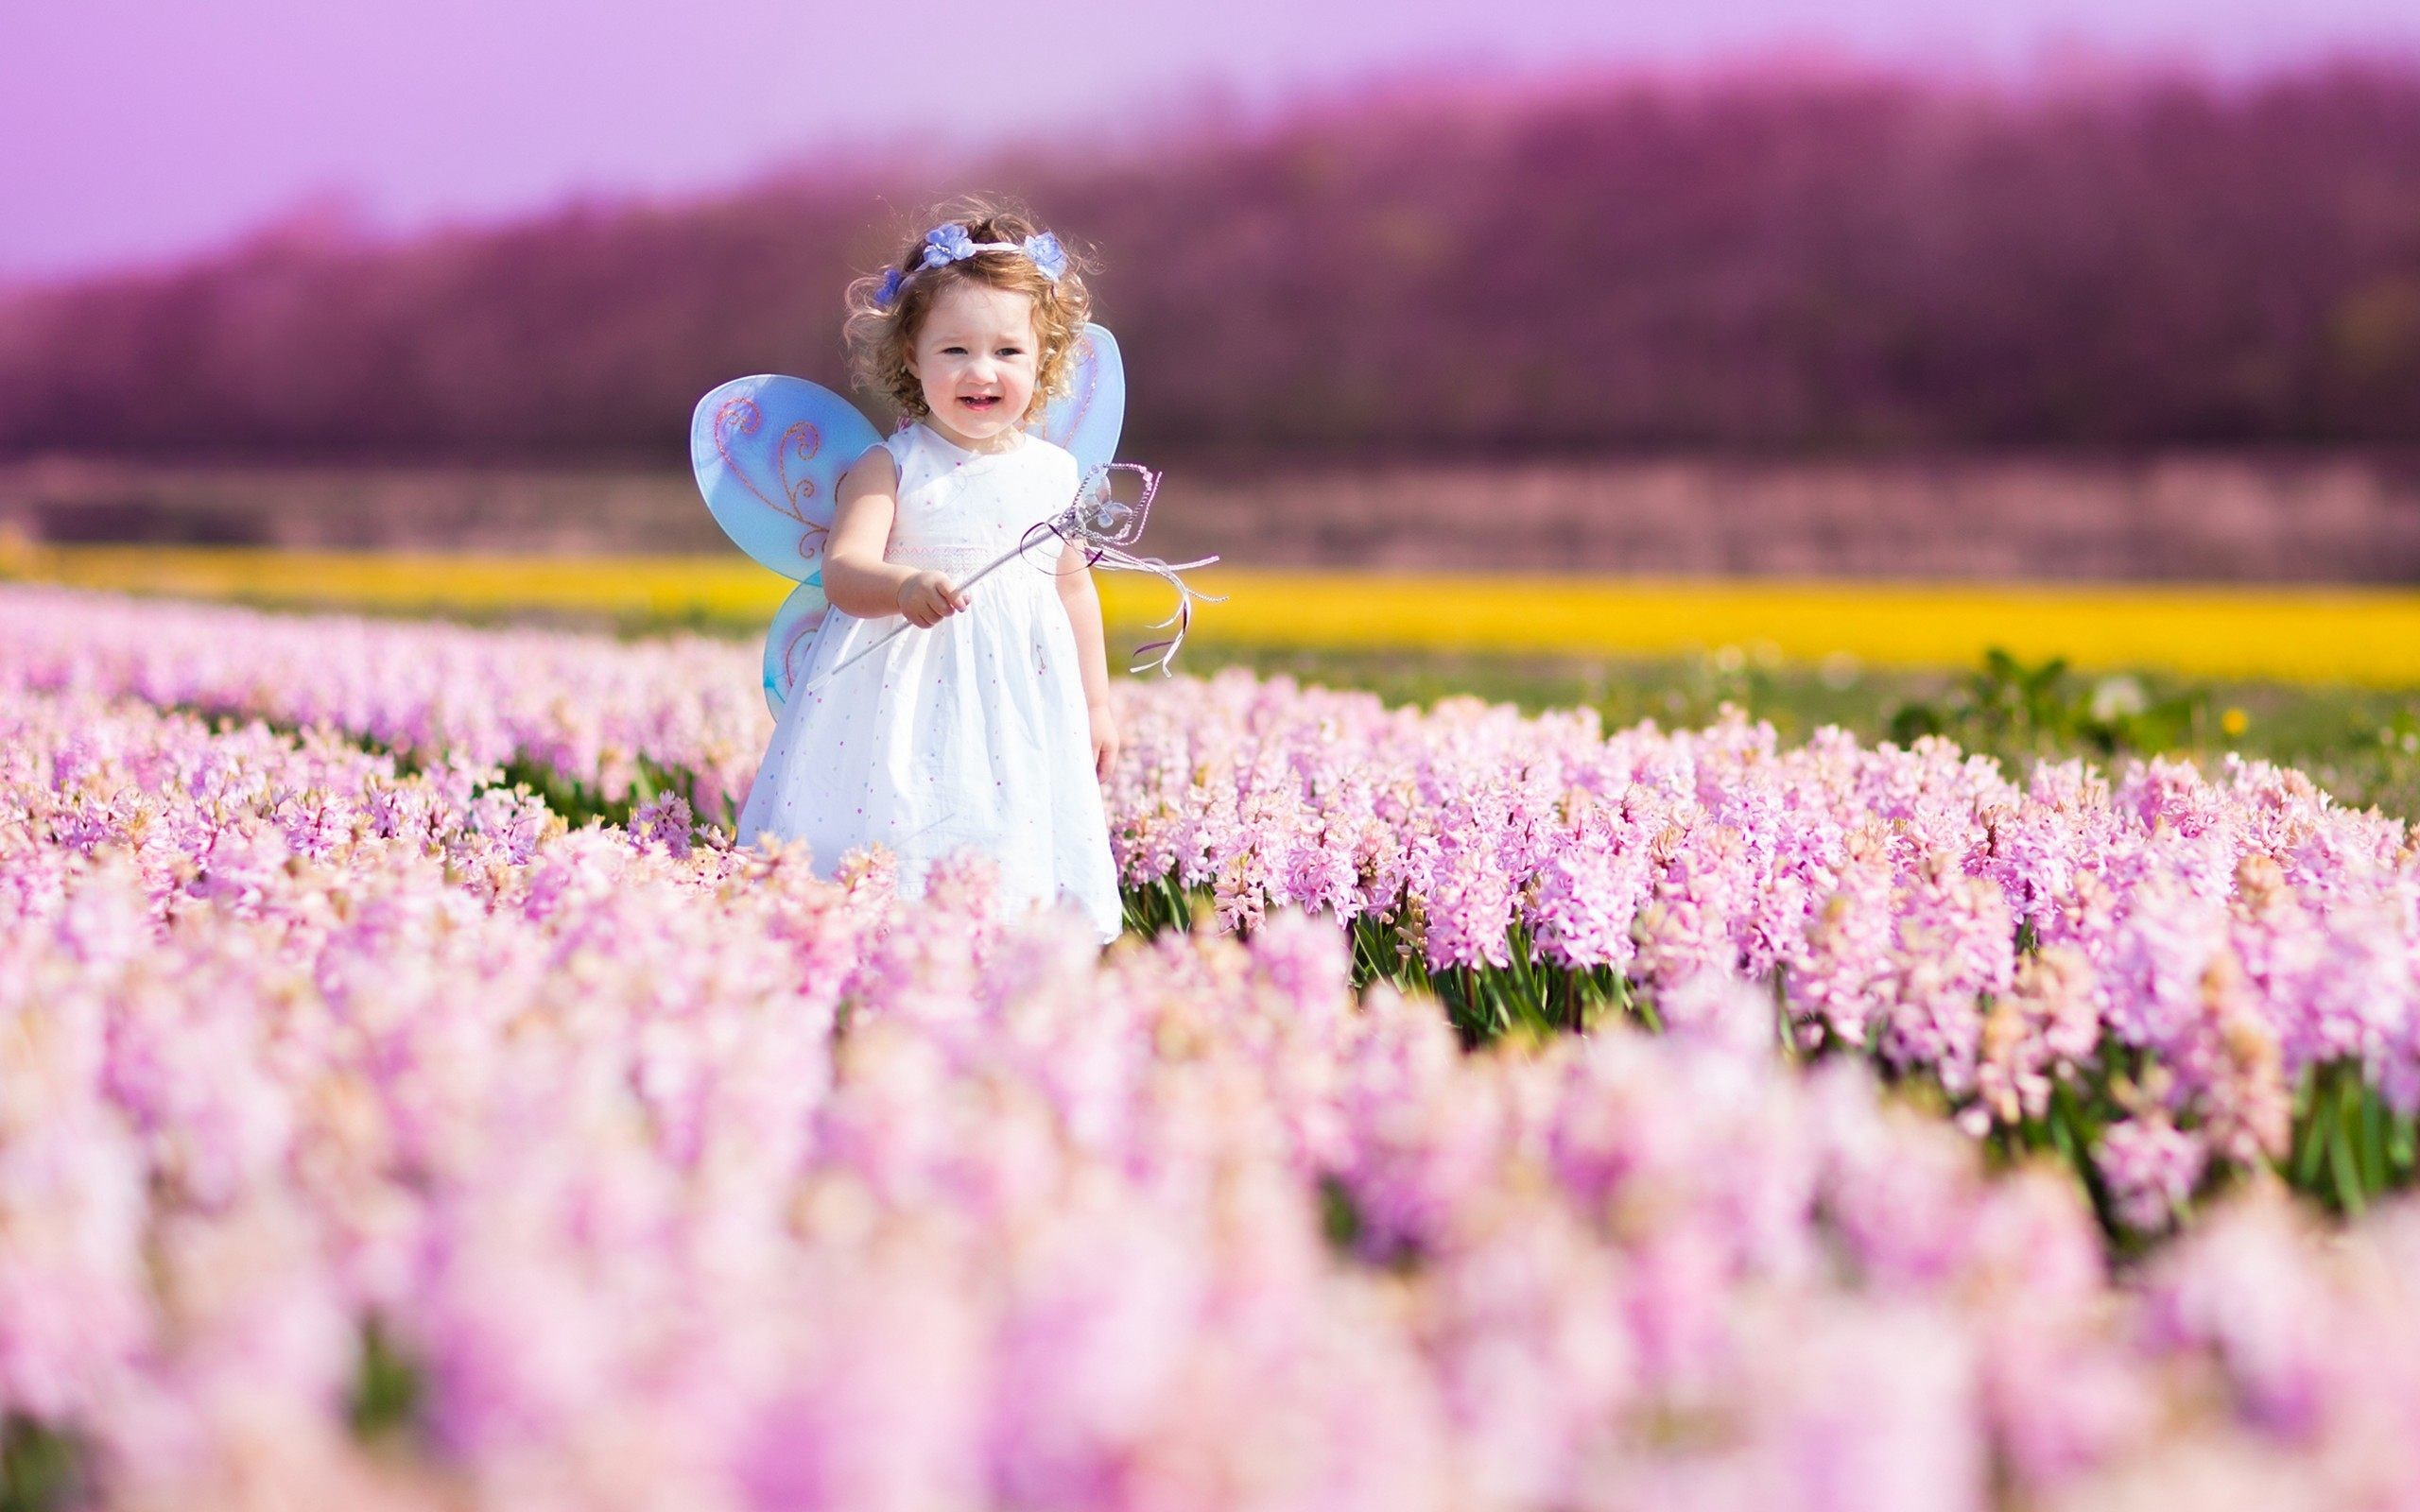 Little Fairy Cute Girl Wallpaper HD Download For Desktop